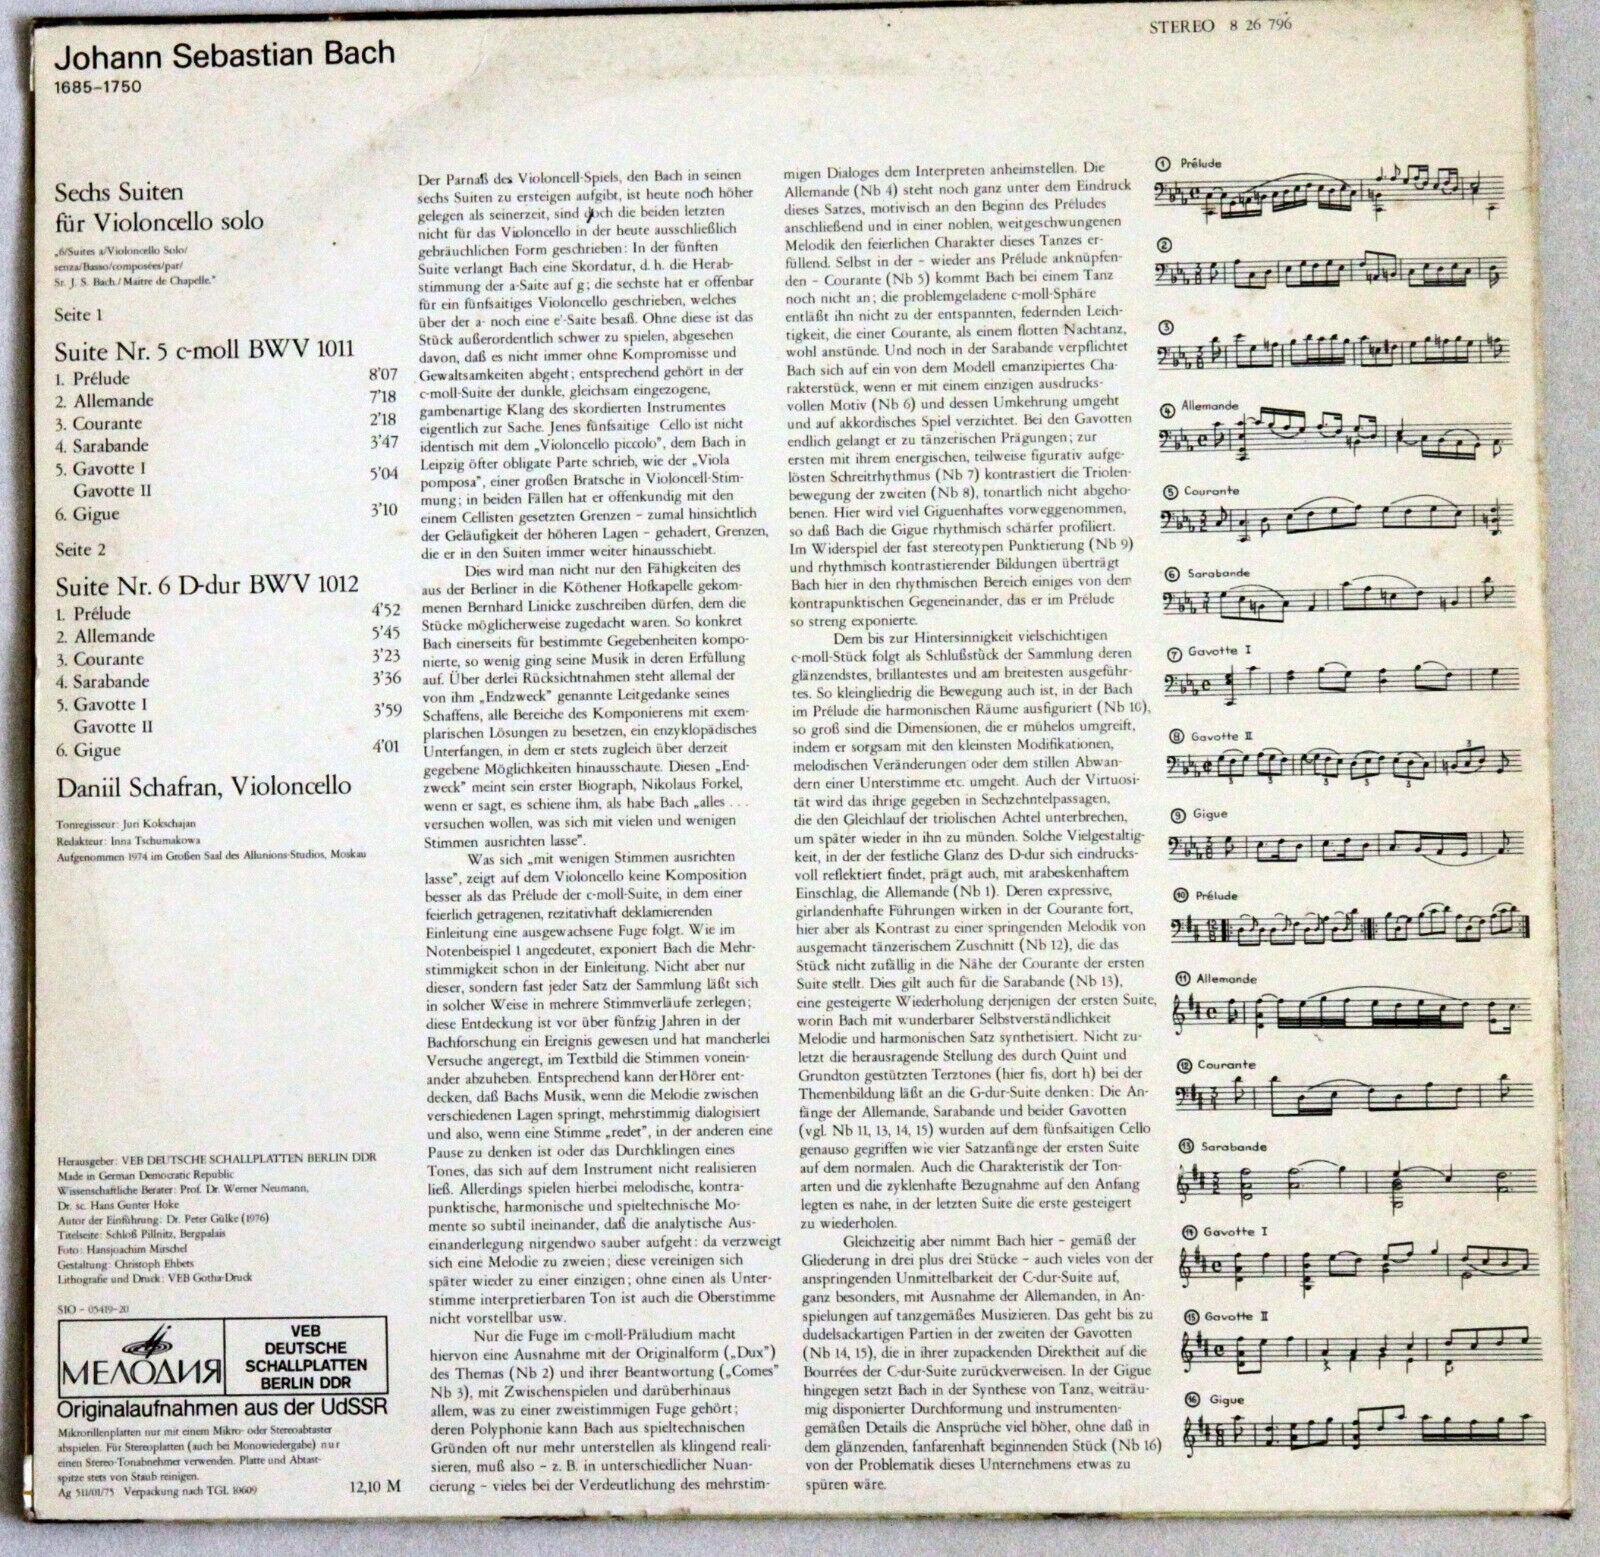 Eterna Melodiya SCHAFRAN (SHAFRAN) BACH Suites for Cello Solo N°5 & 6 LP Ed 1